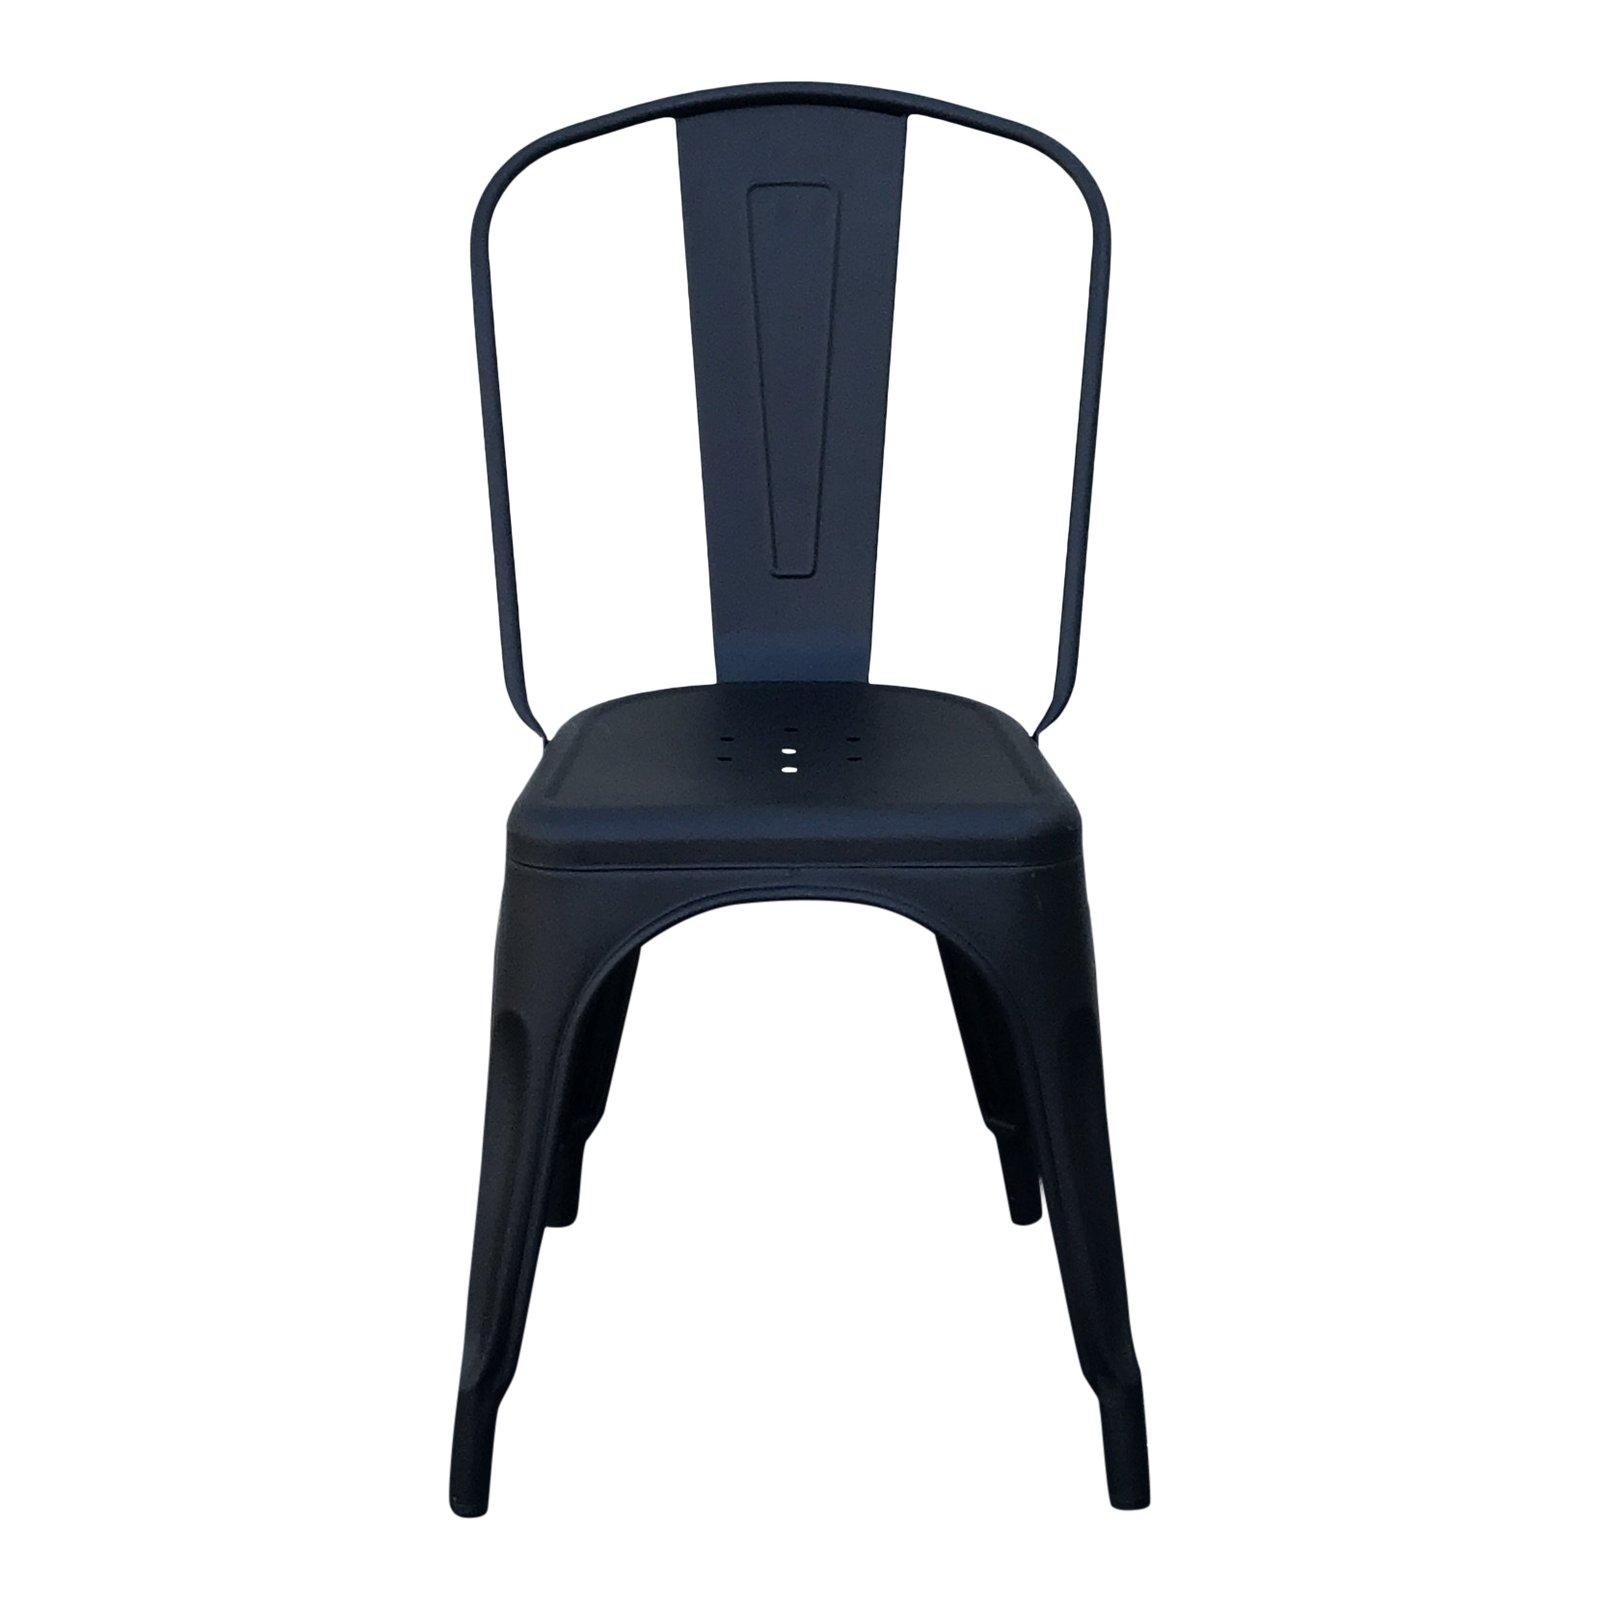 matte-black-tolix-chair-5411.jpg